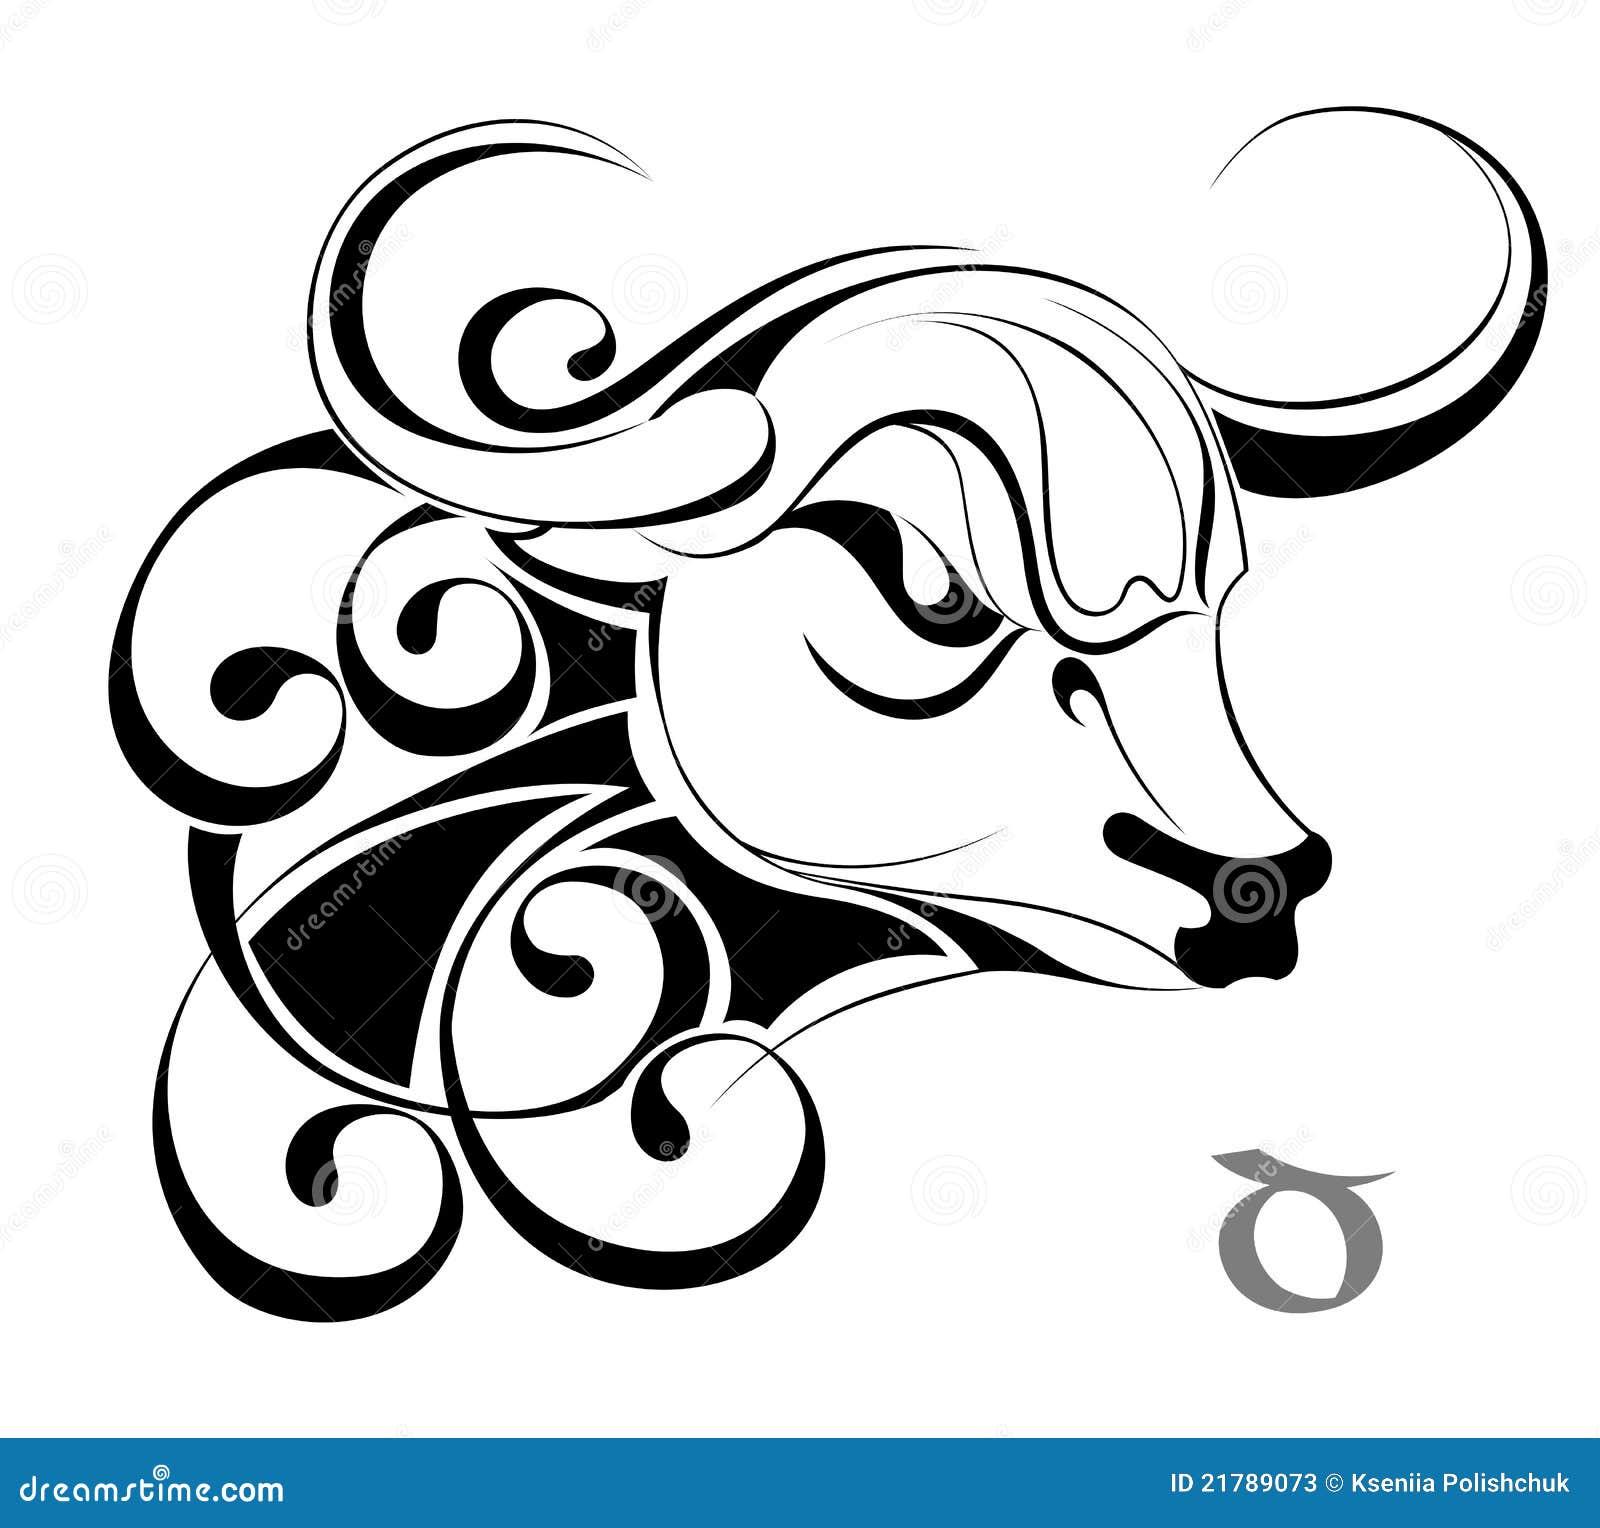 Taurus Zodiac Sign Tattoo Design